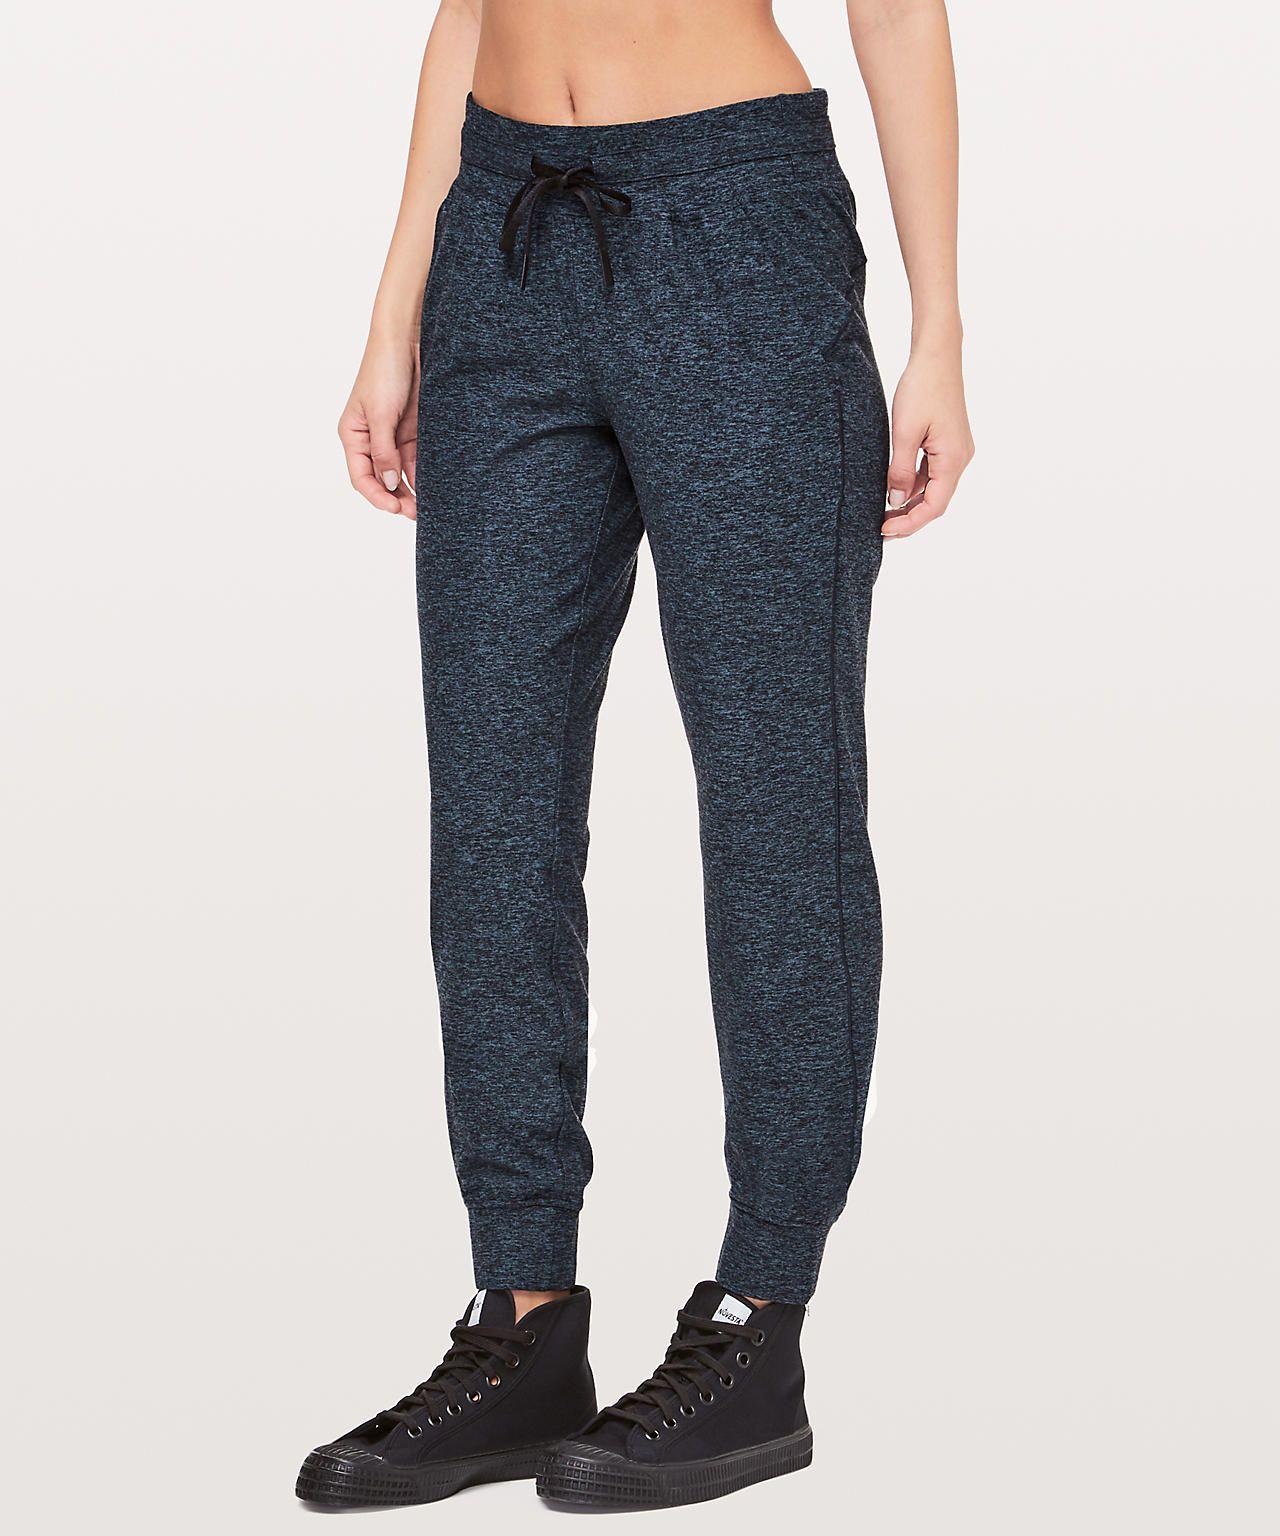 Heathered true navyblack pants for women technical